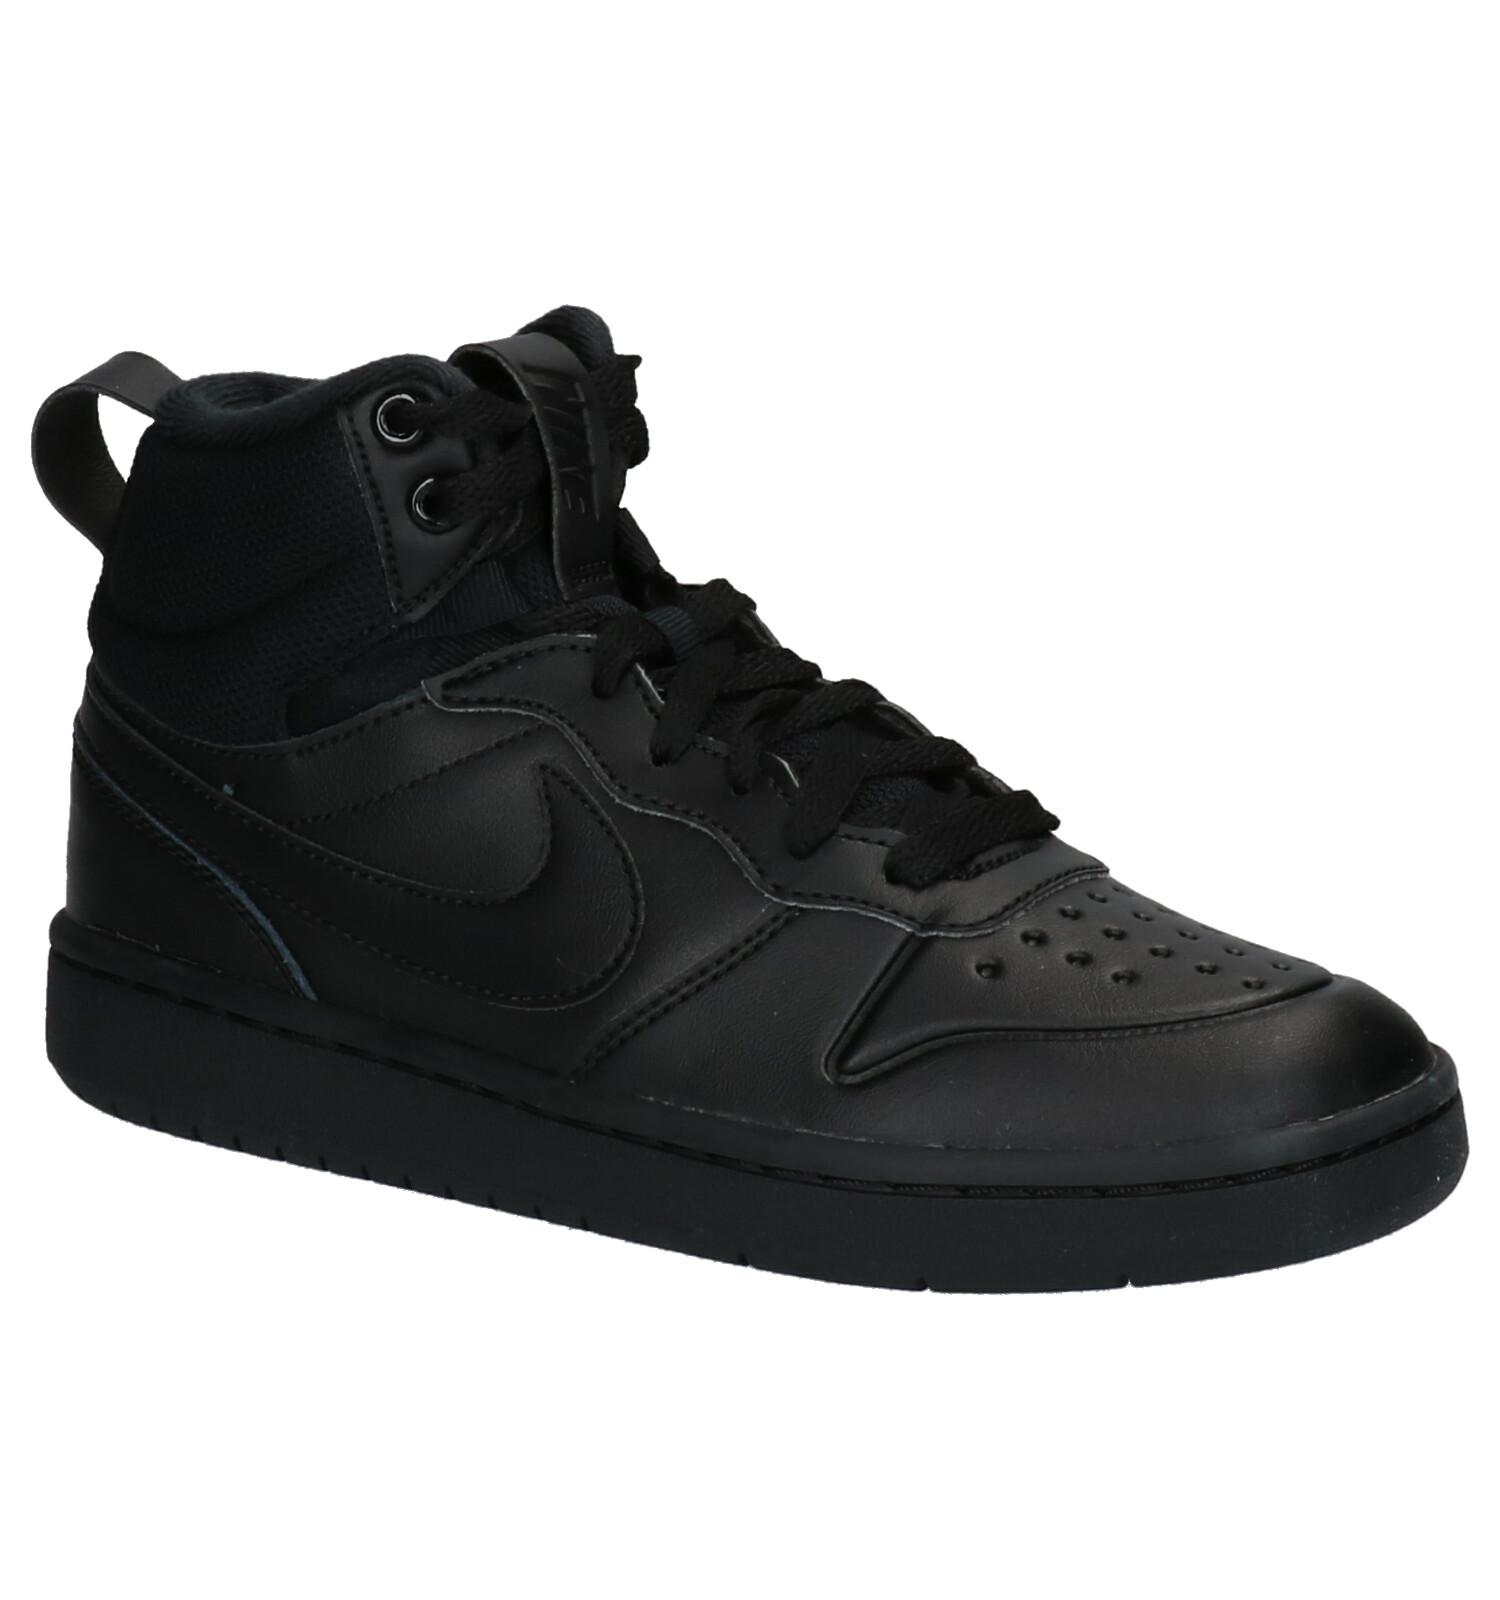 Nike Court Borough Mid Zwarte Sneakers   TORFS.BE   Gratis verzend en retour